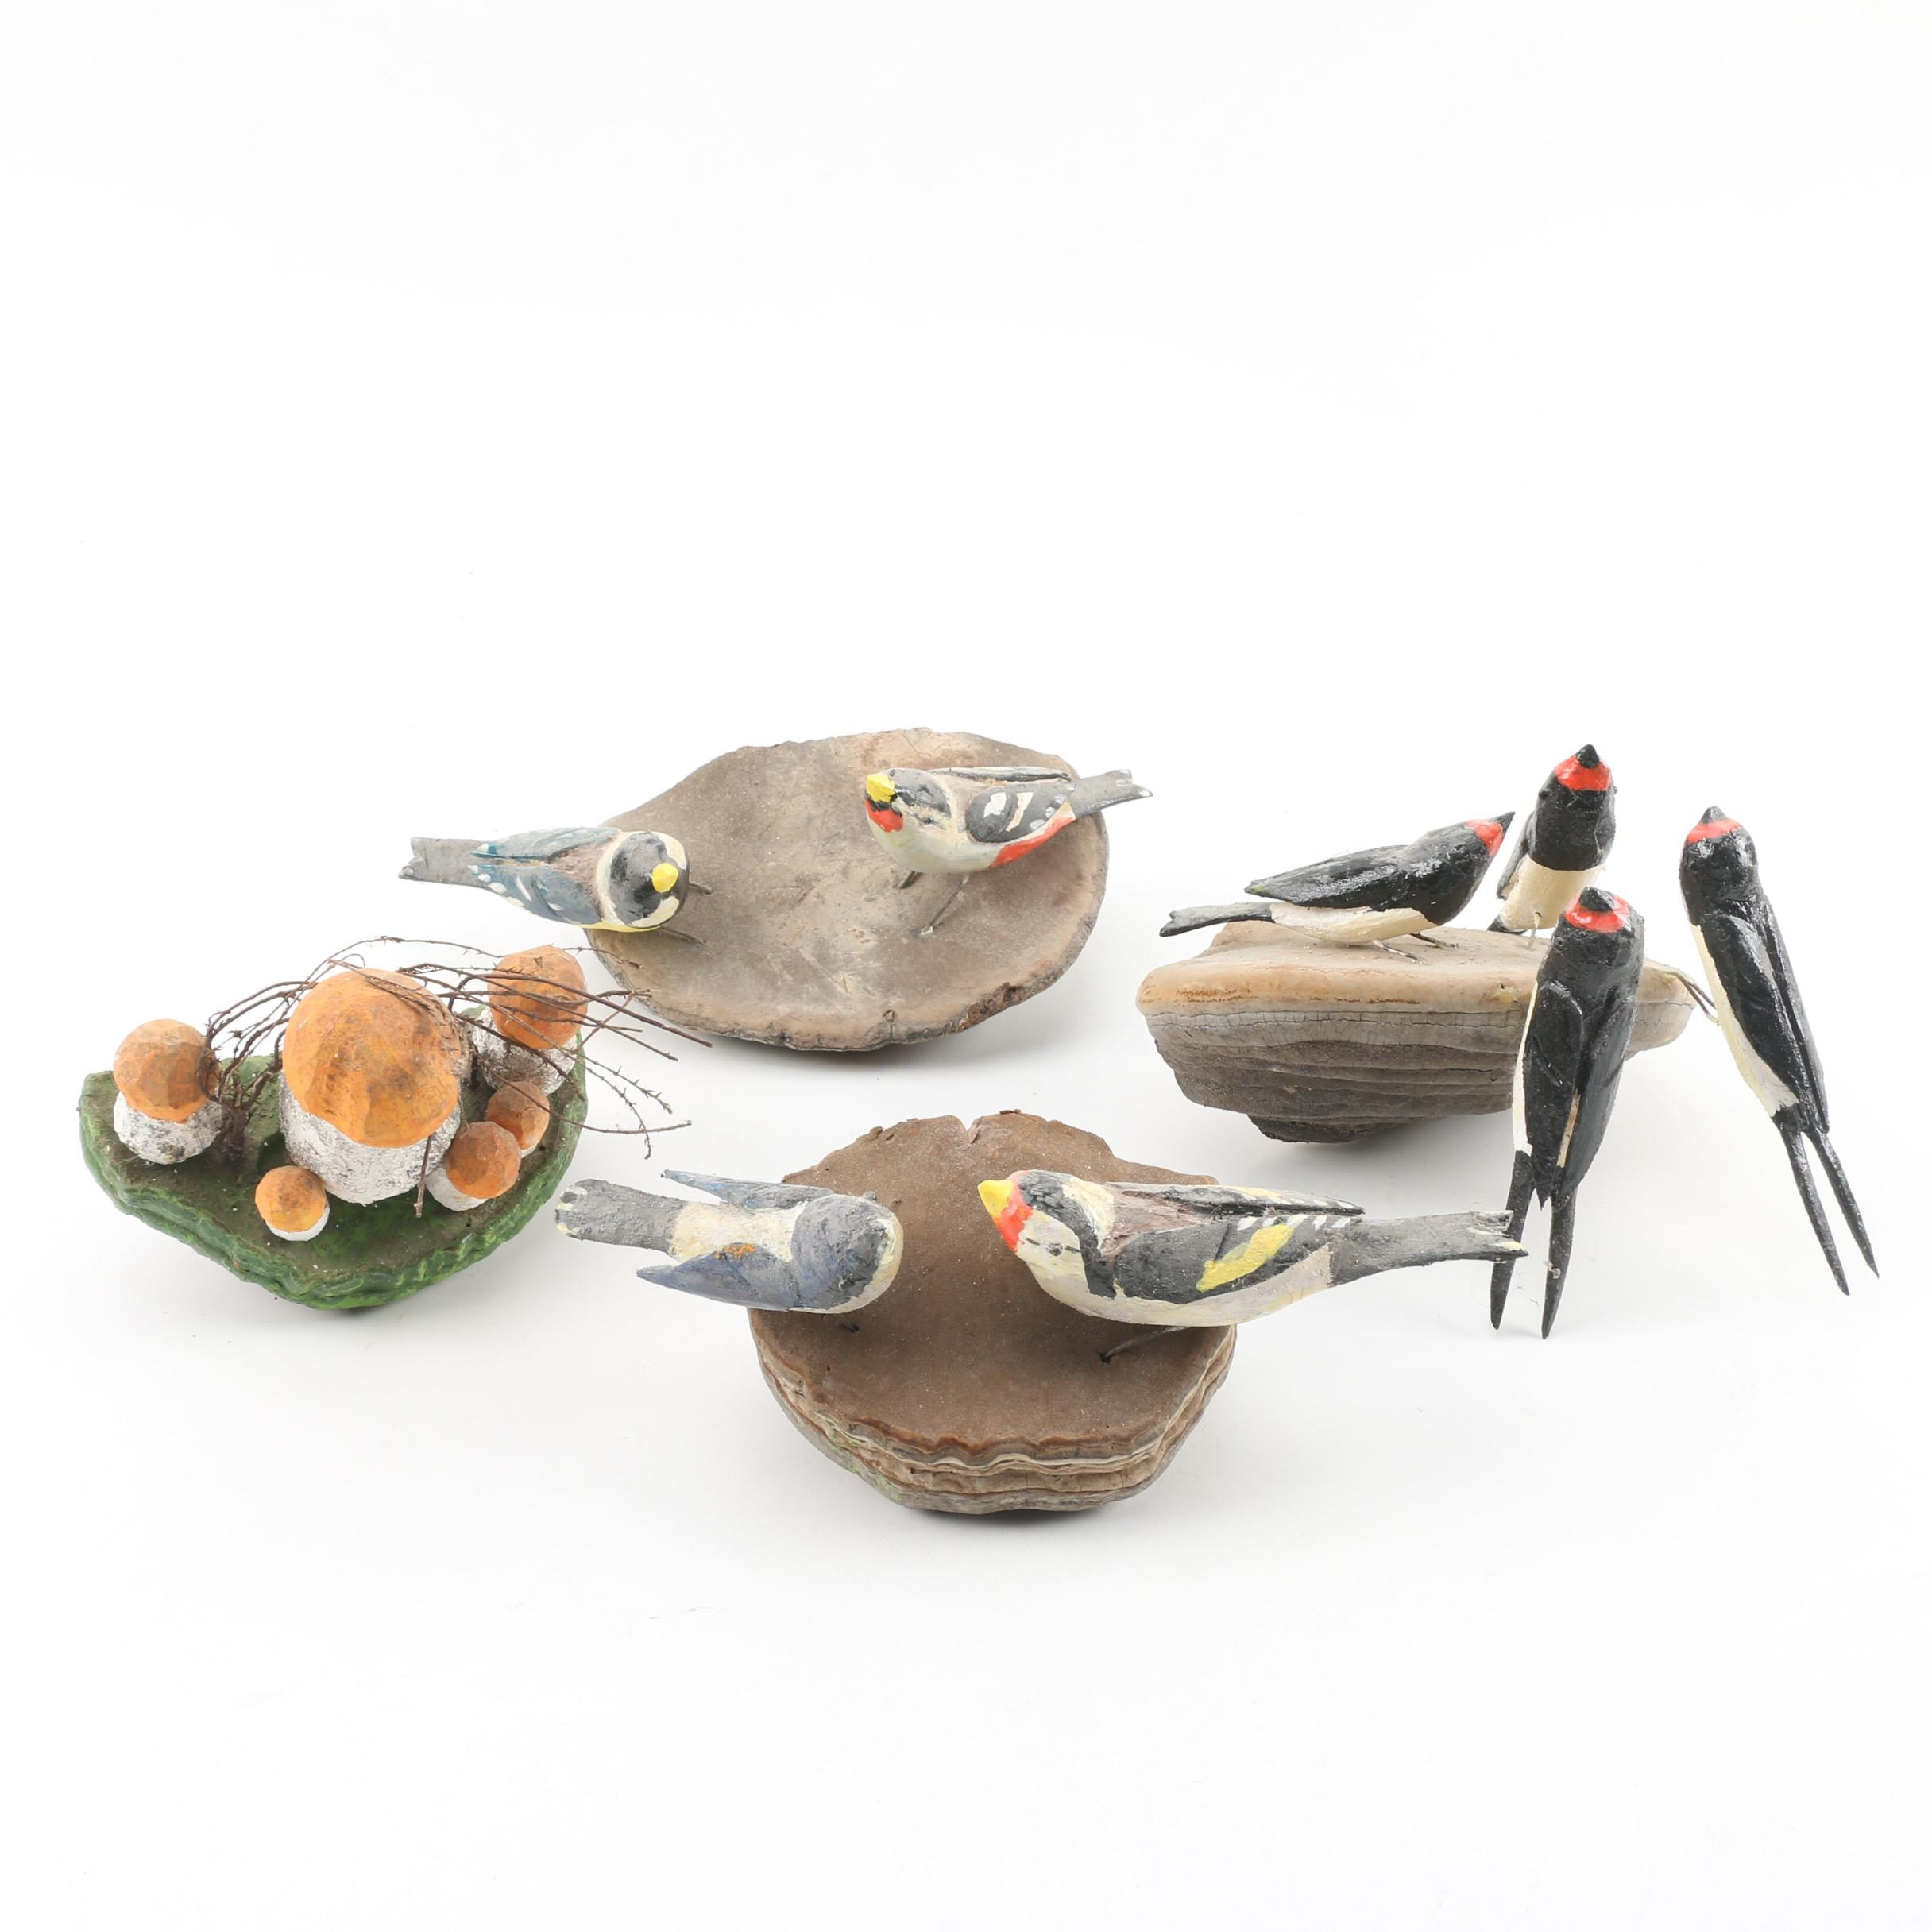 European Style Folk Art Bird and Mushroom Carvings